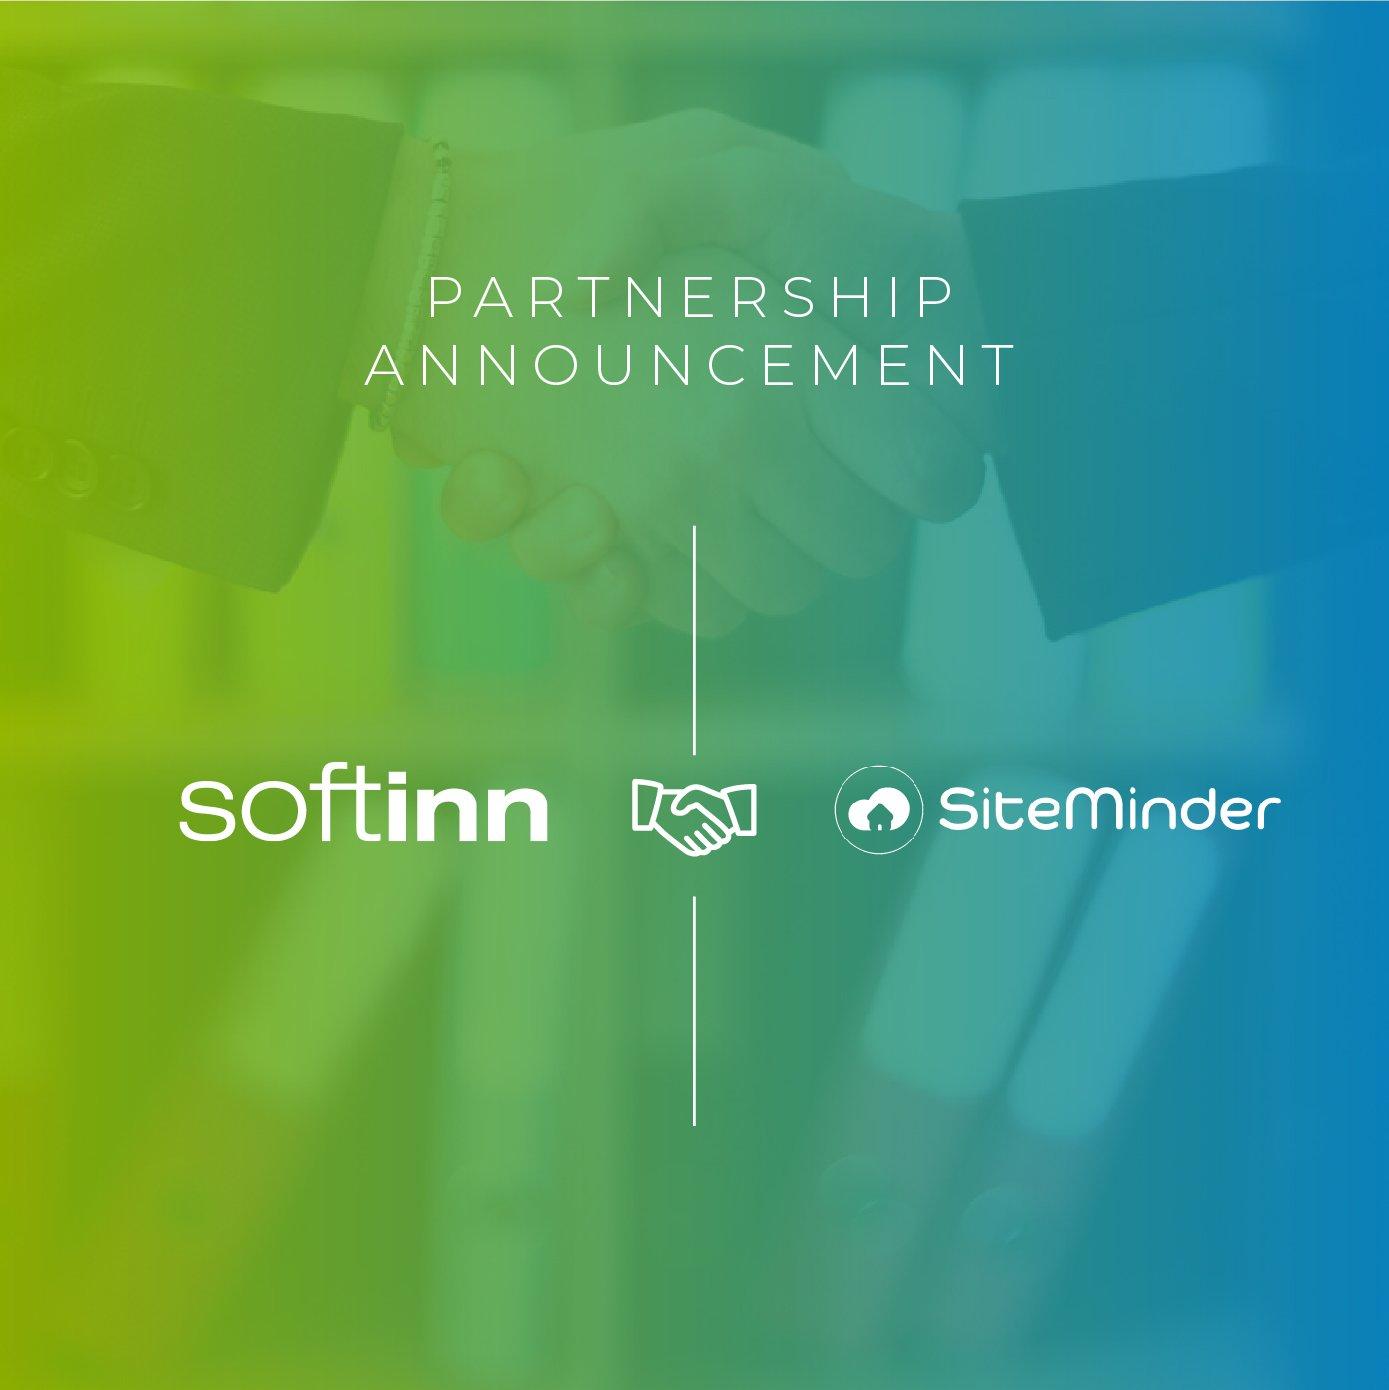 partnership-01